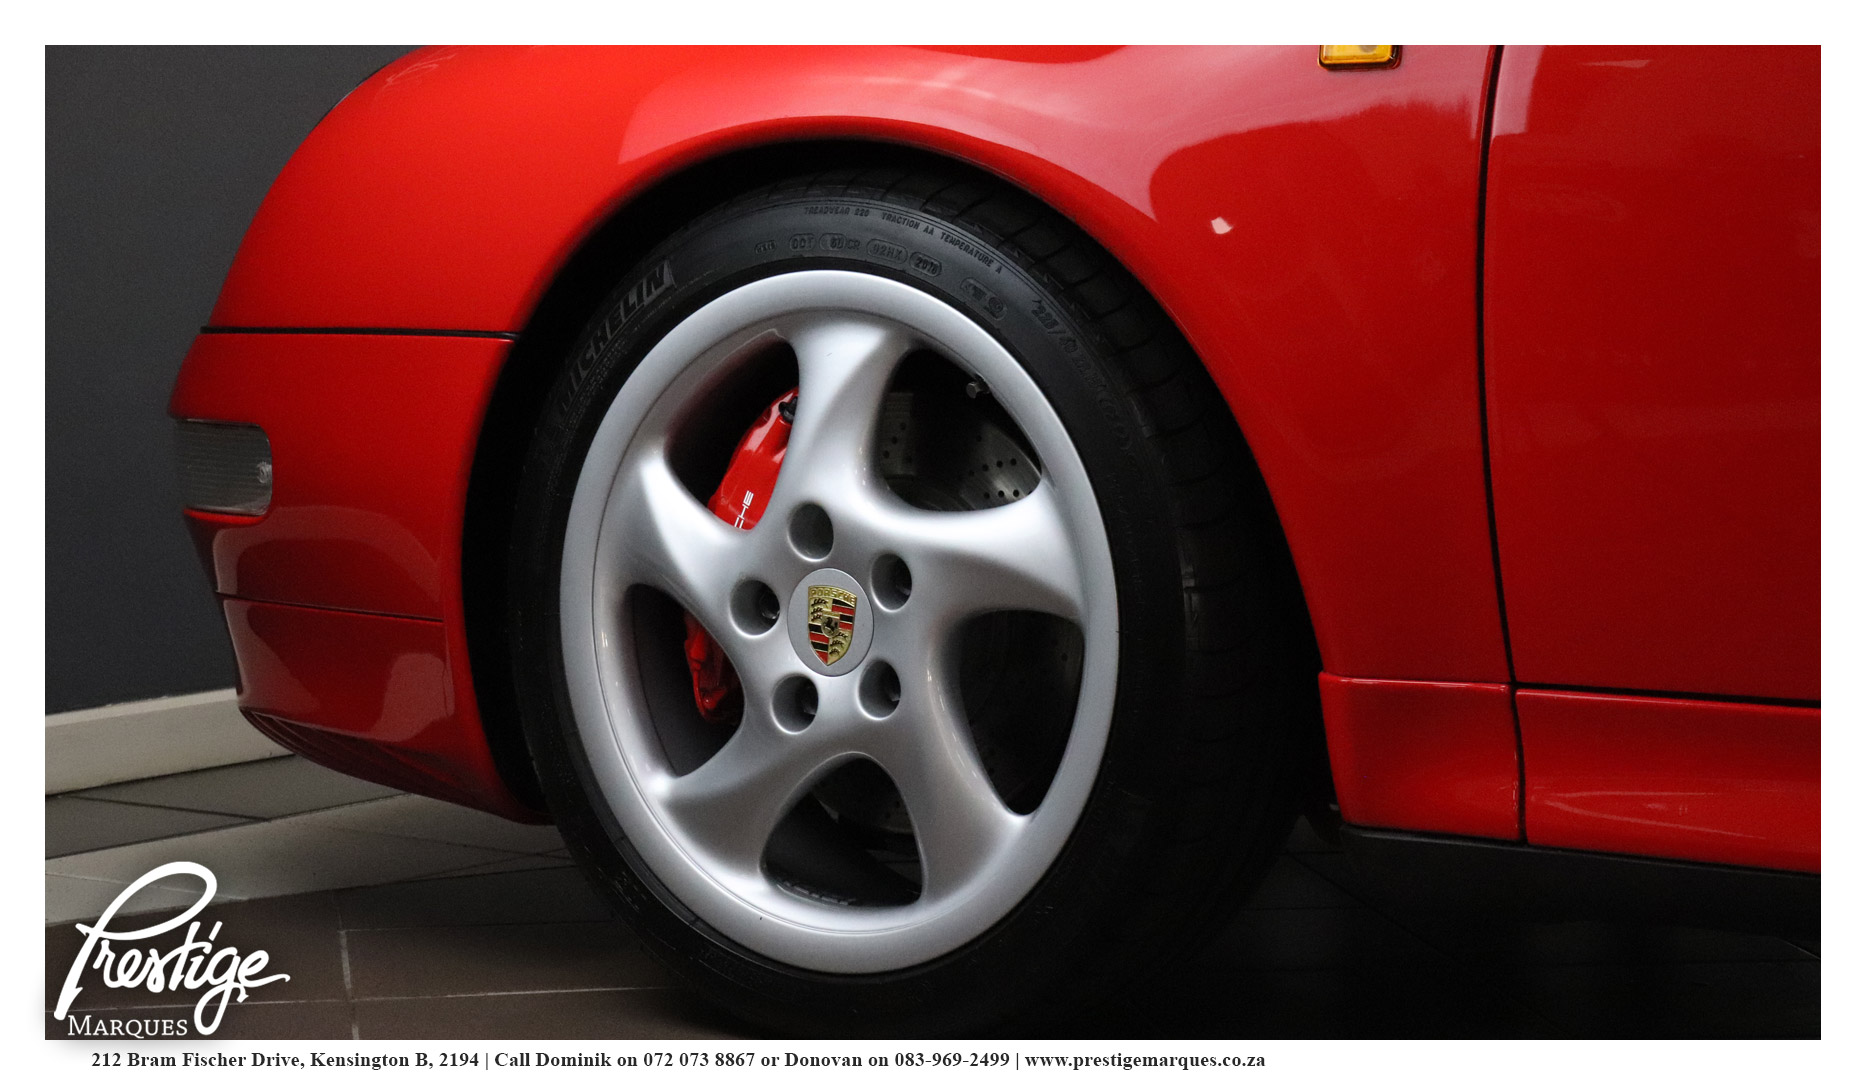 Porsche-911-993-Turbo-Prestige-Marques-Randburg-Sandton-12